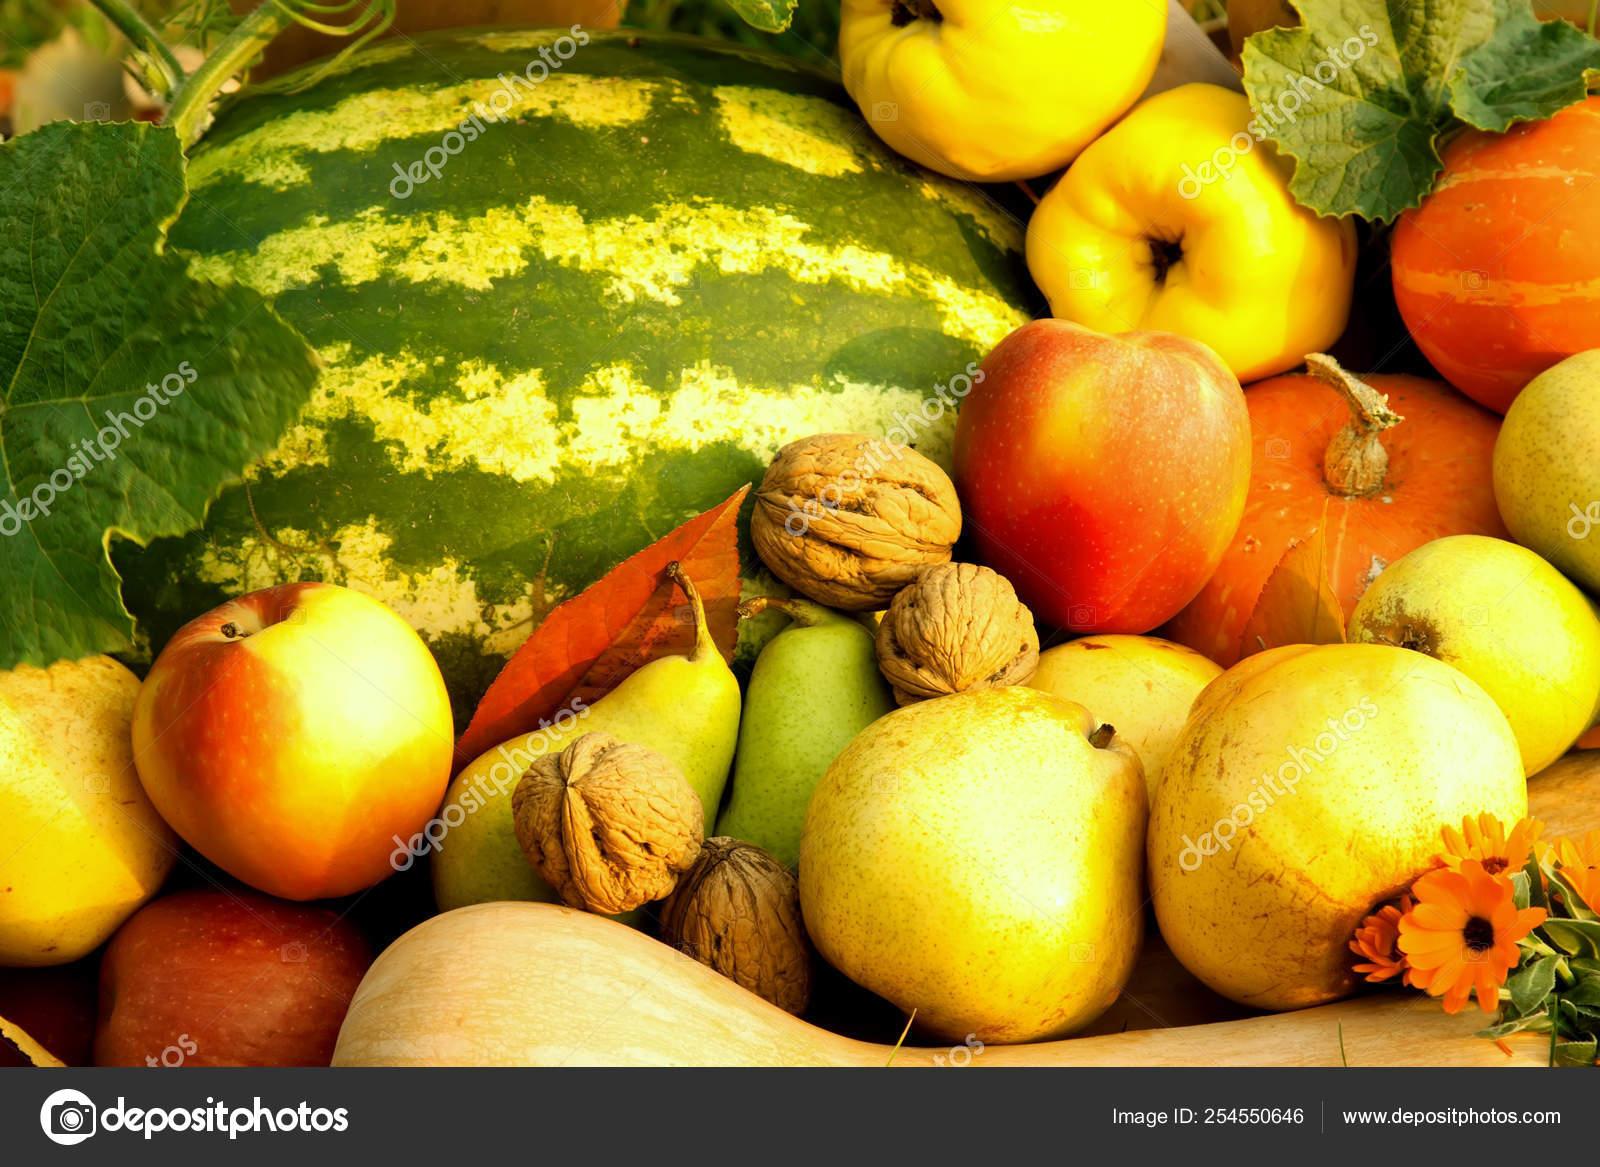 Harvest In The Autumn Garden Healthy Food Stock Photo